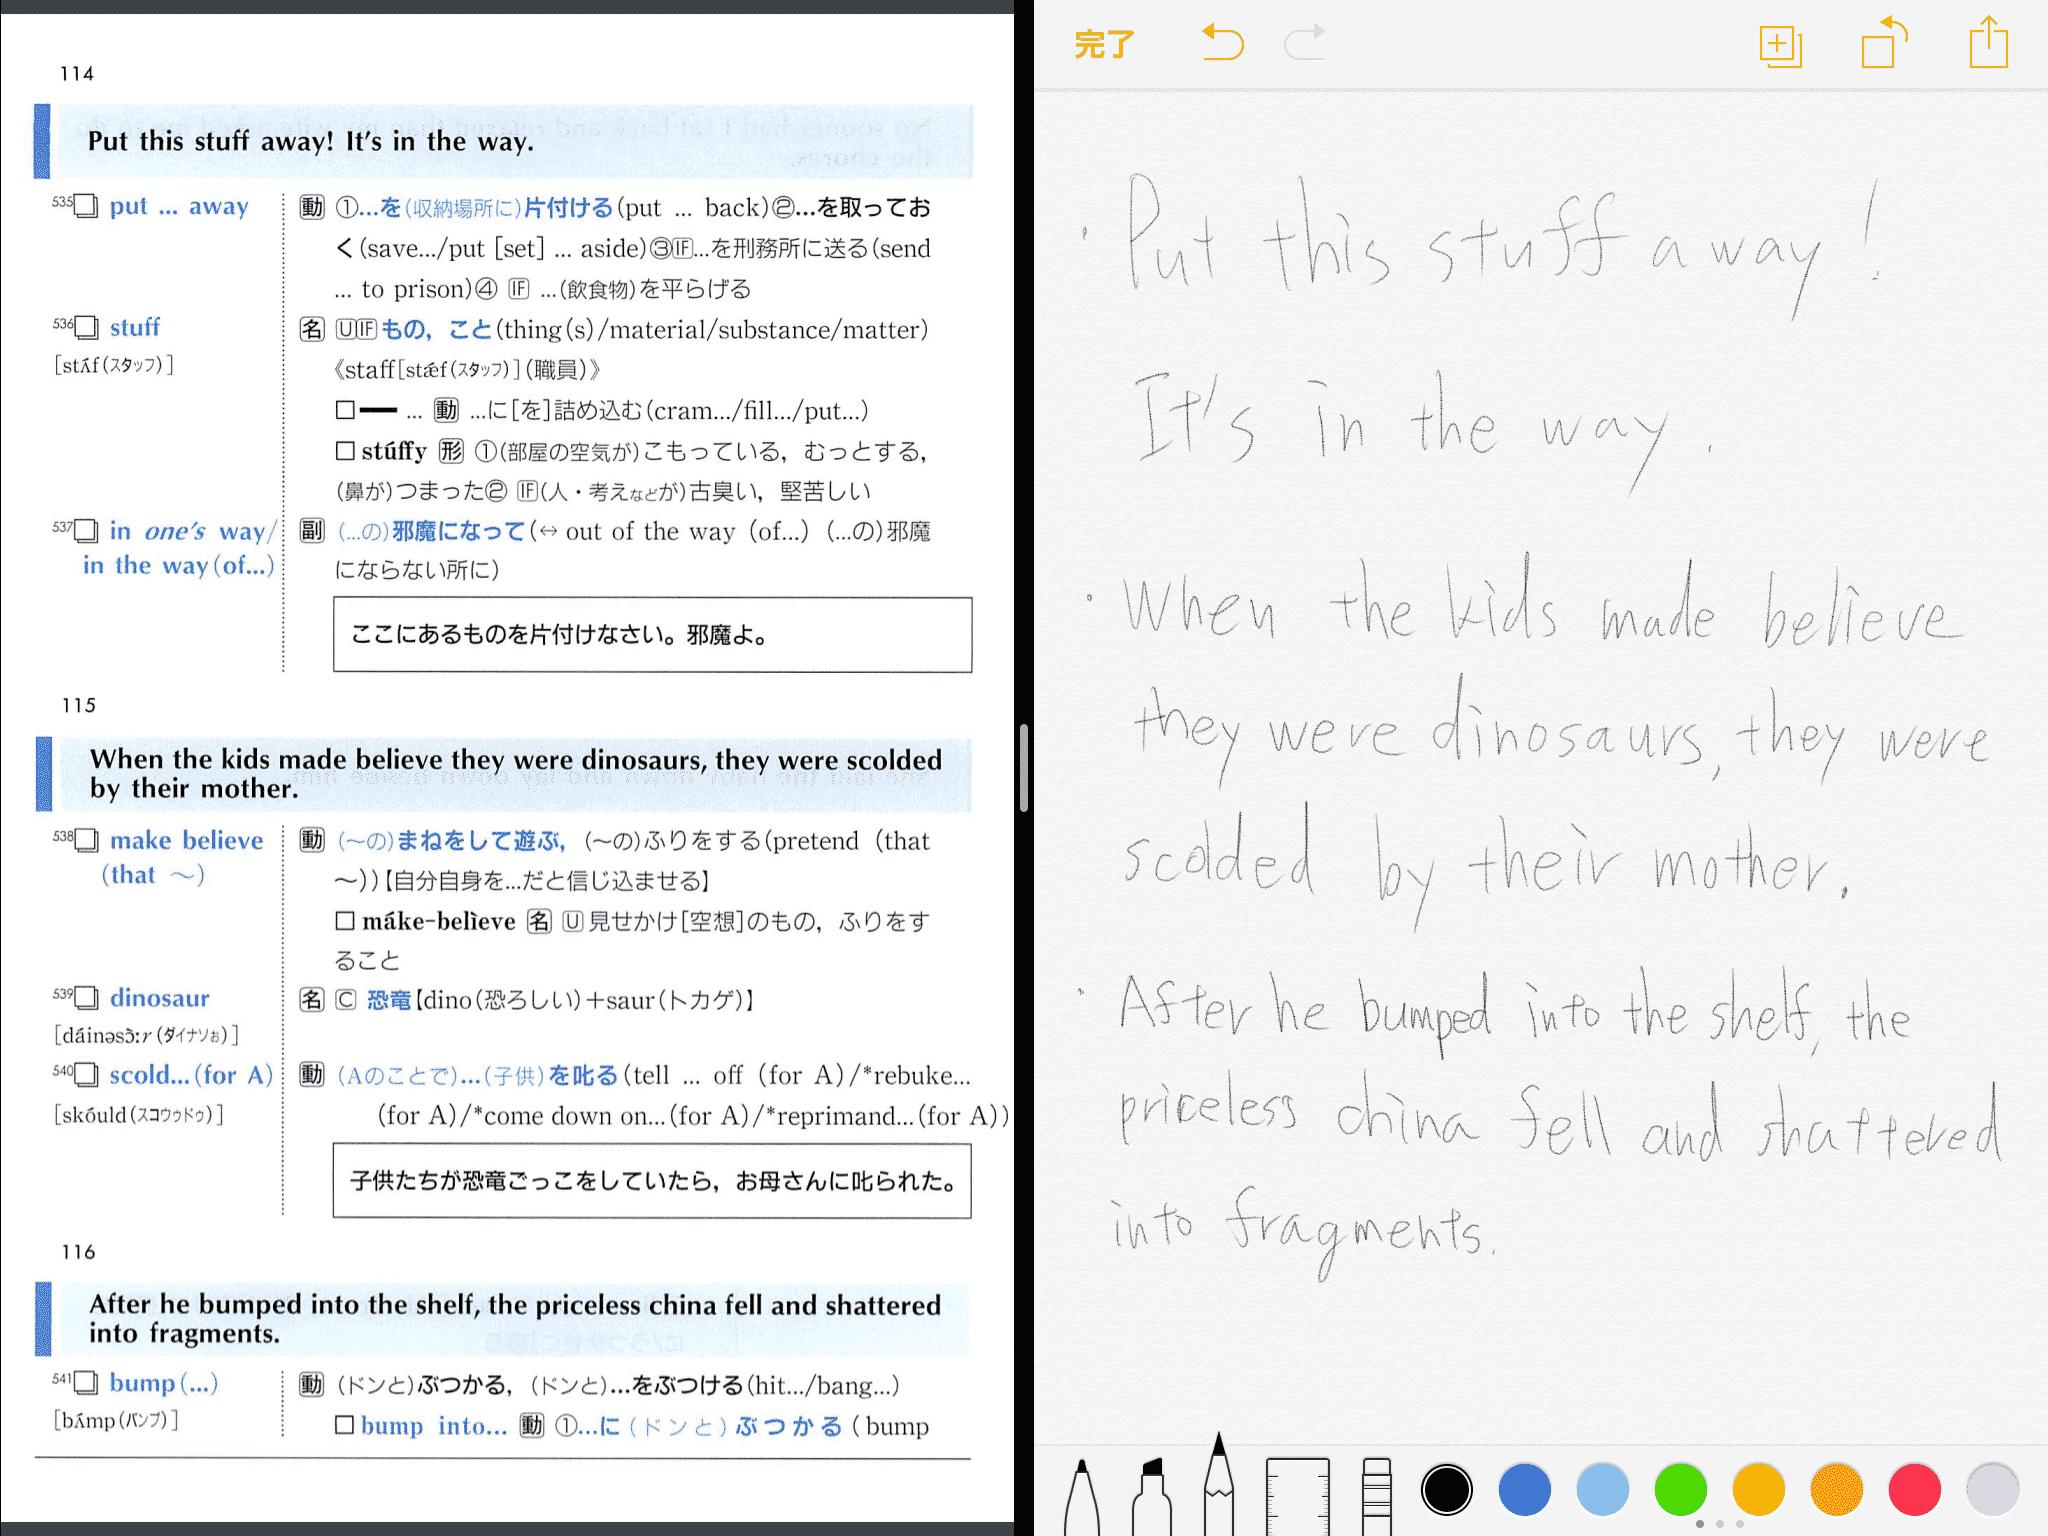 PDF Expert とメモ帳とApple Pencilの併用